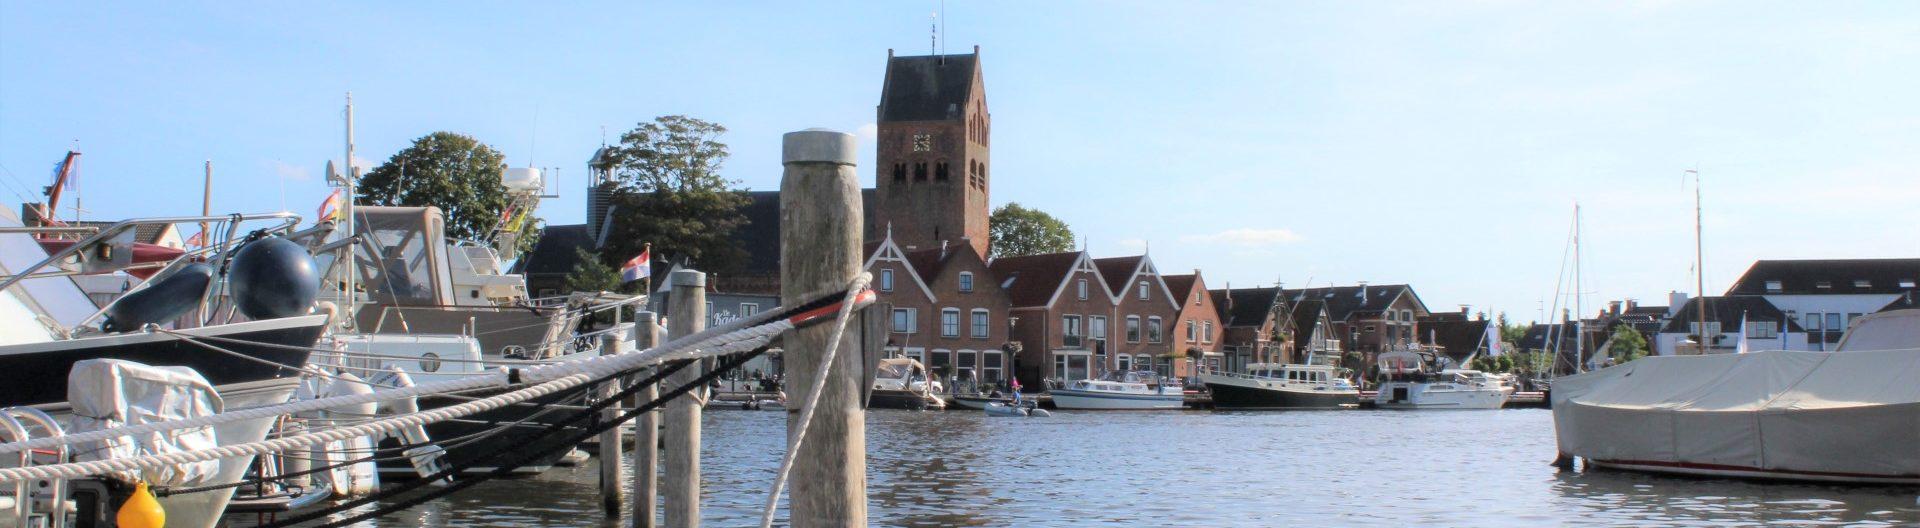 Grou Jachthaven De Oerhaal